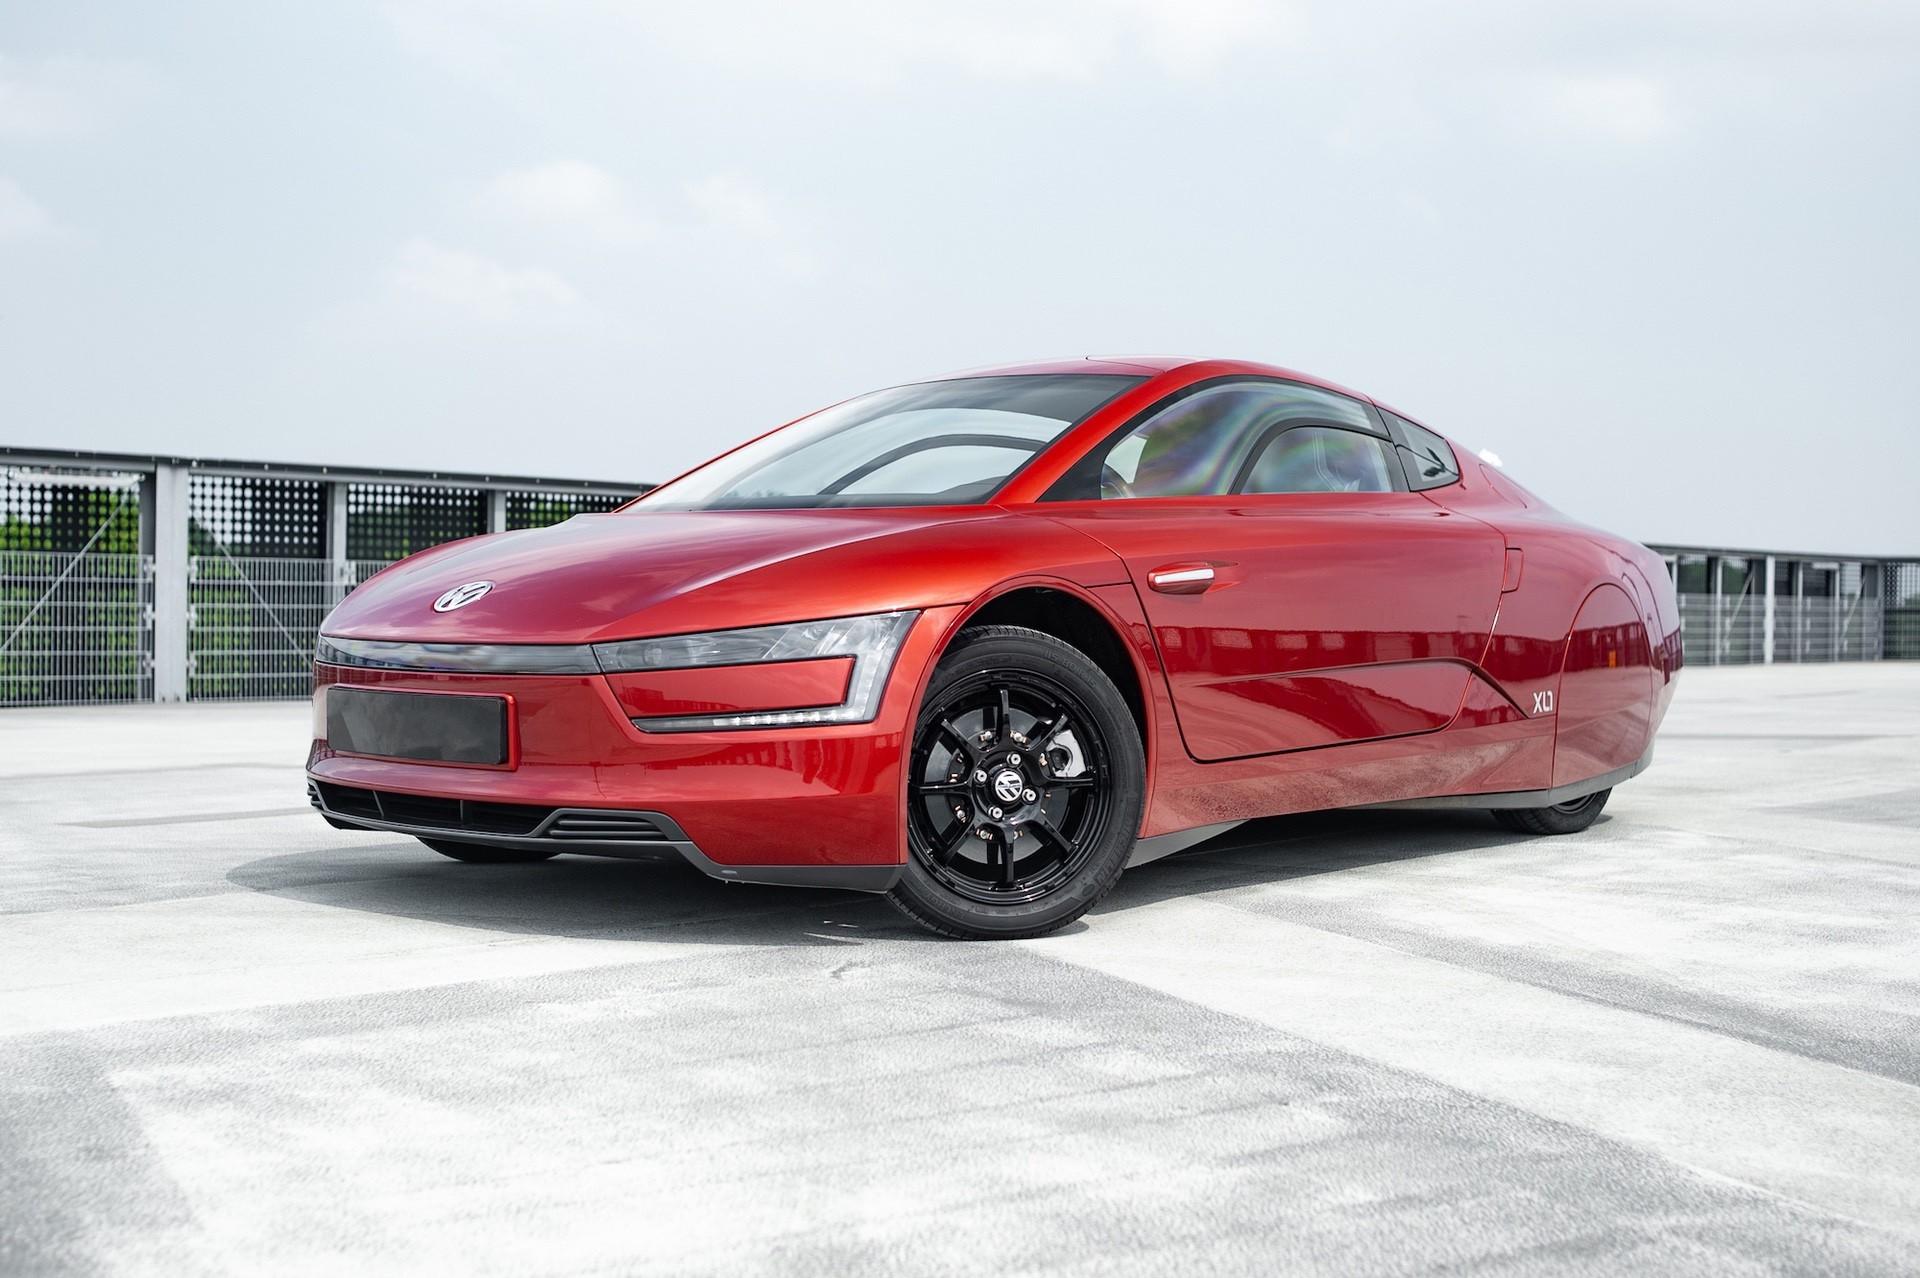 Volkswagen_XL1_sale-0029